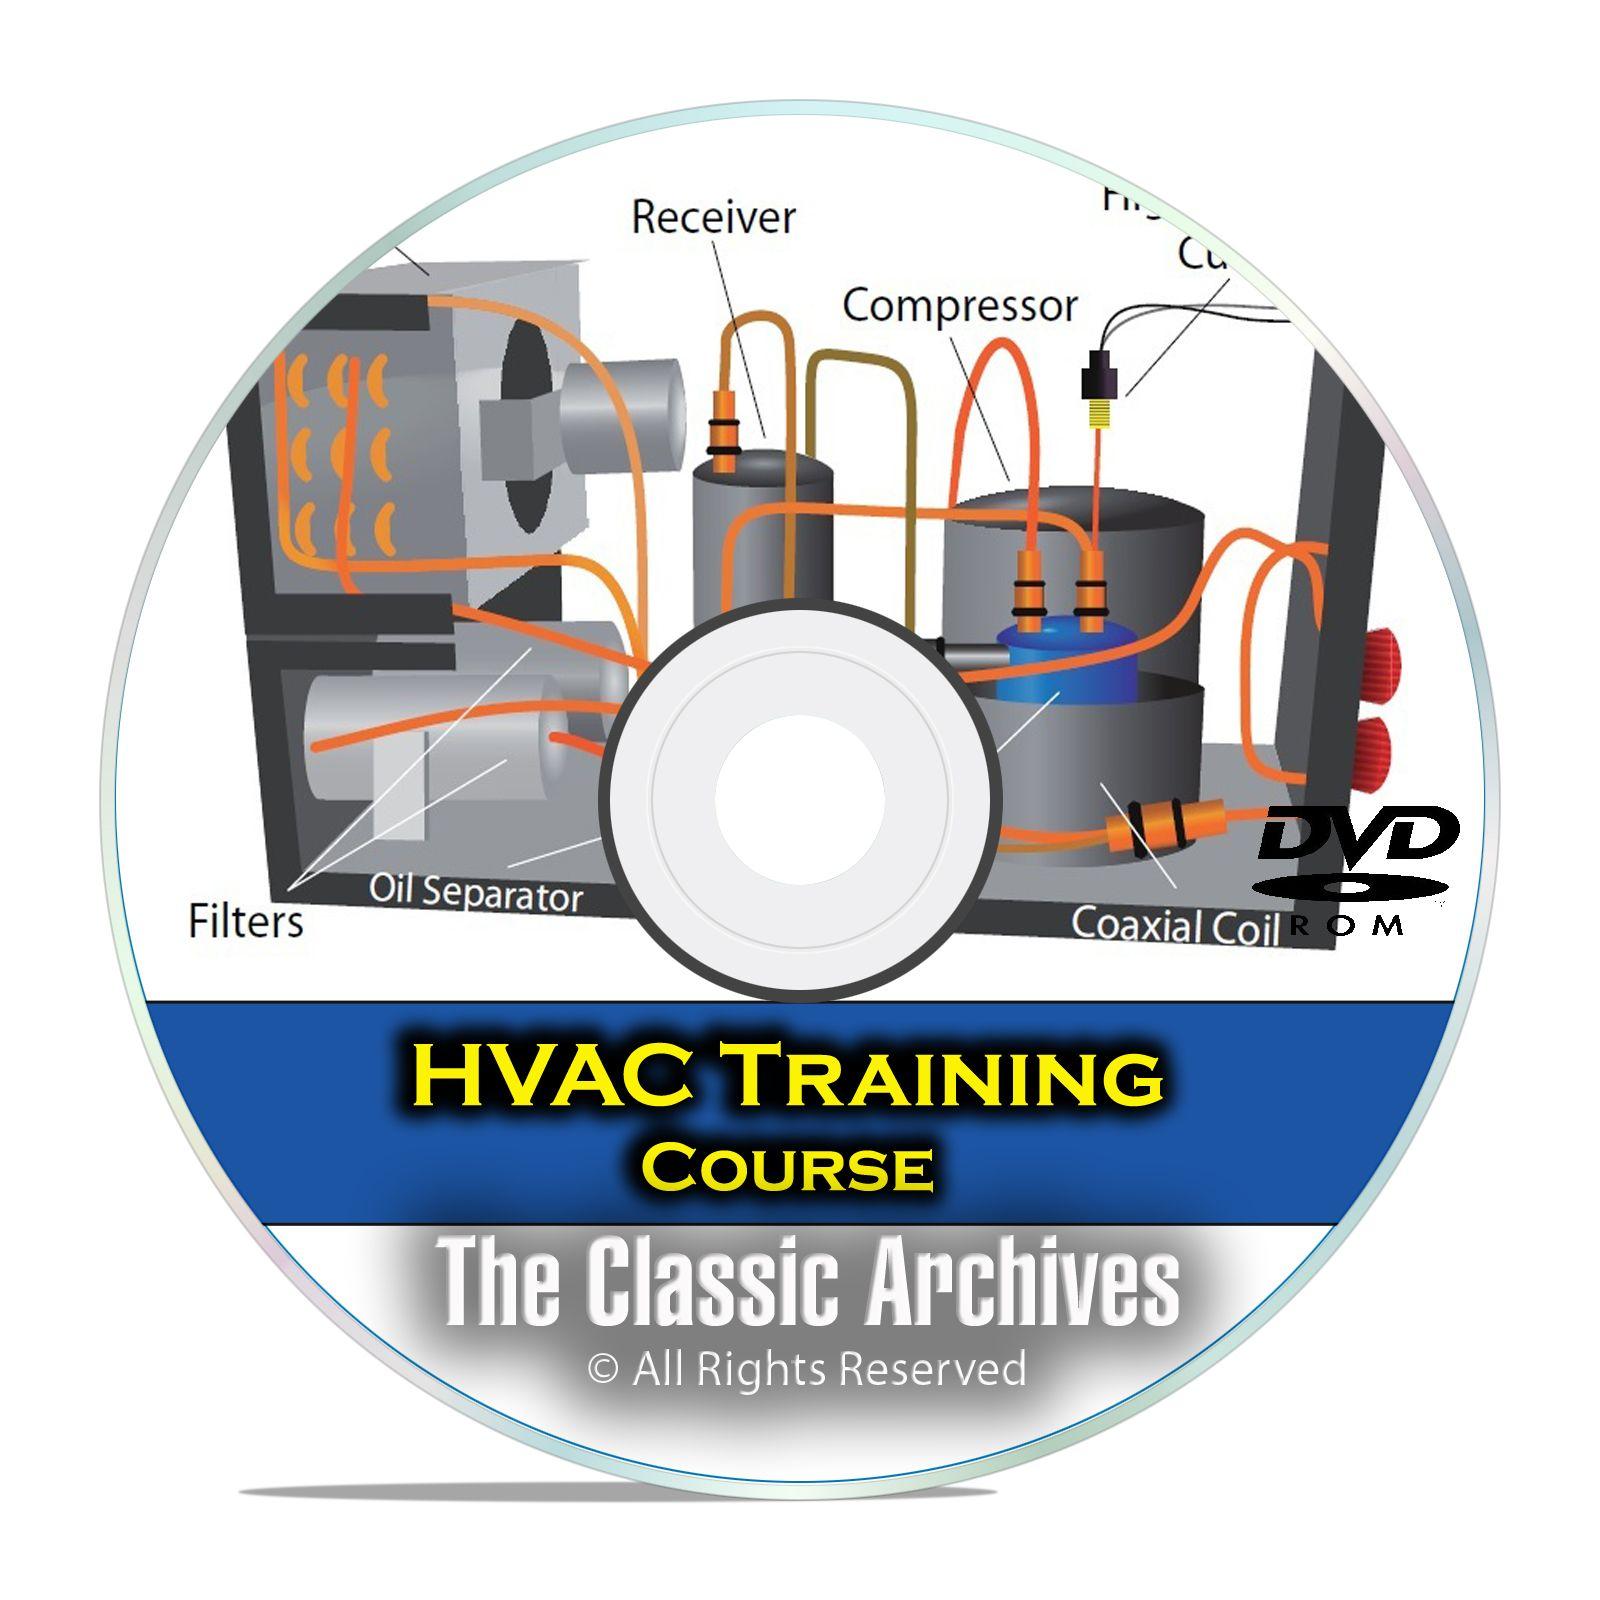 HVAC Journeyman Training Course, Heating Air Conditioning